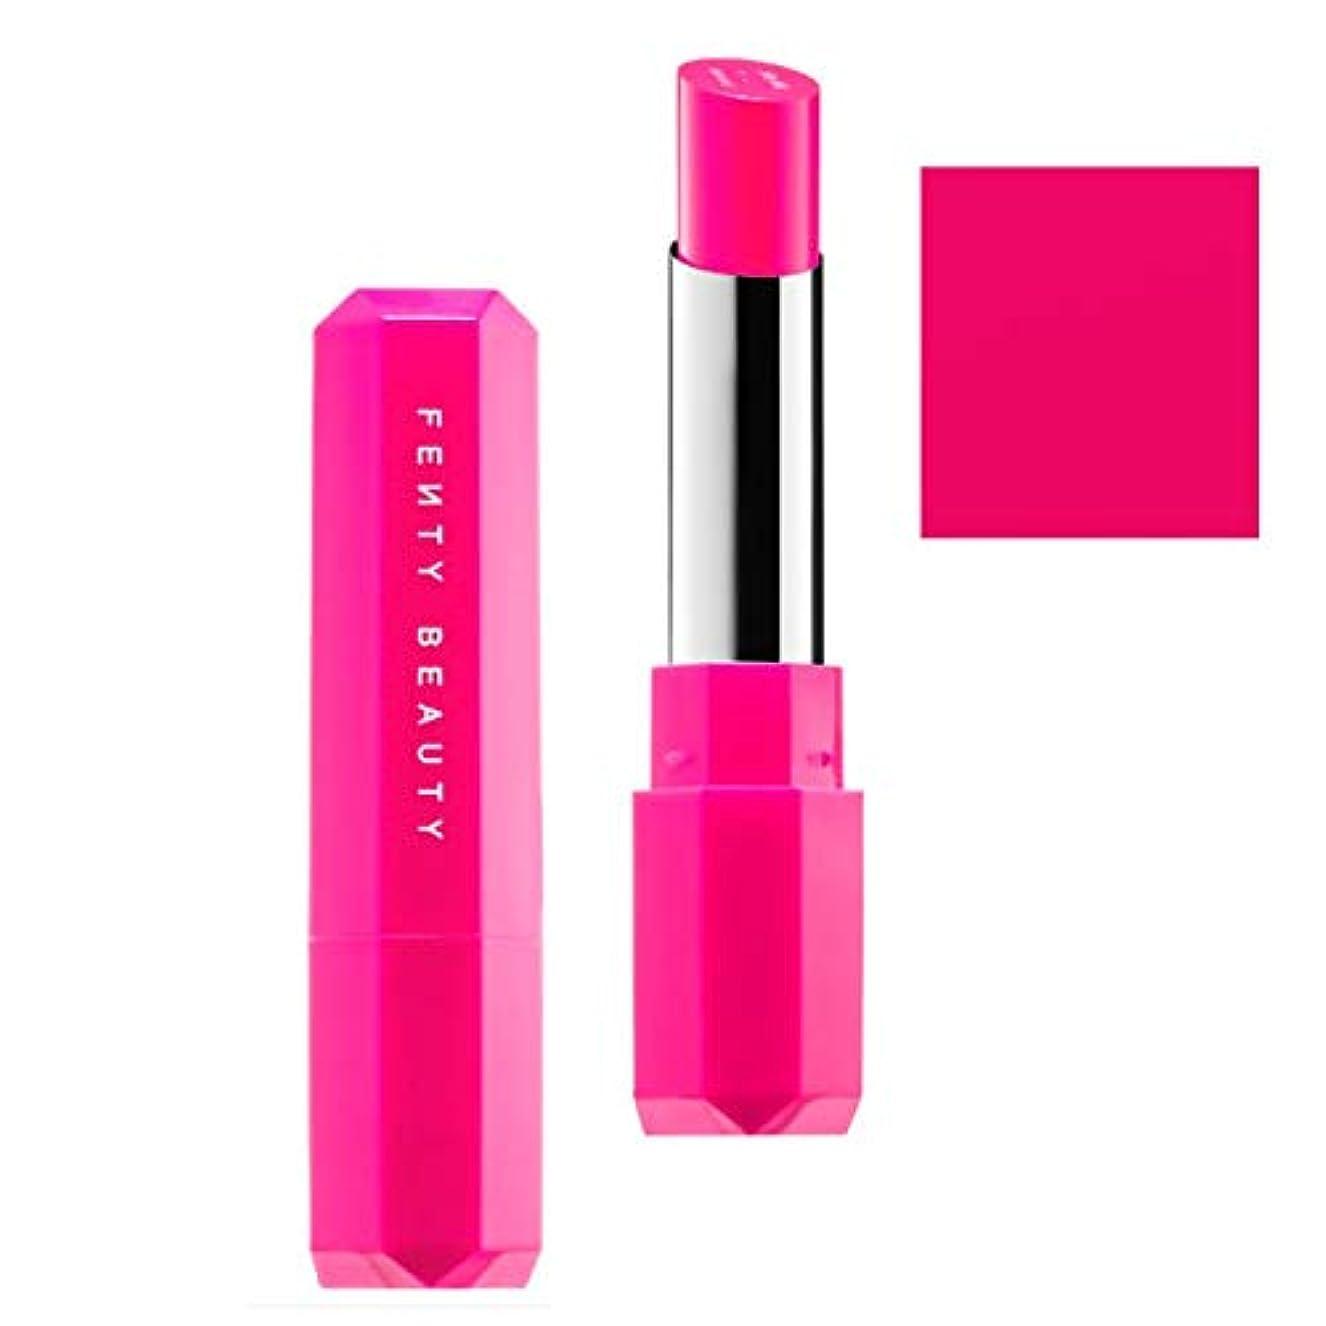 FENTY BEAUTY BY RIHANNA,New!!, 限定版 limited-edition, Poutsicle Juicy Satin Lipstick - Tropic Tantrum [海外直送品] [並行輸入品]